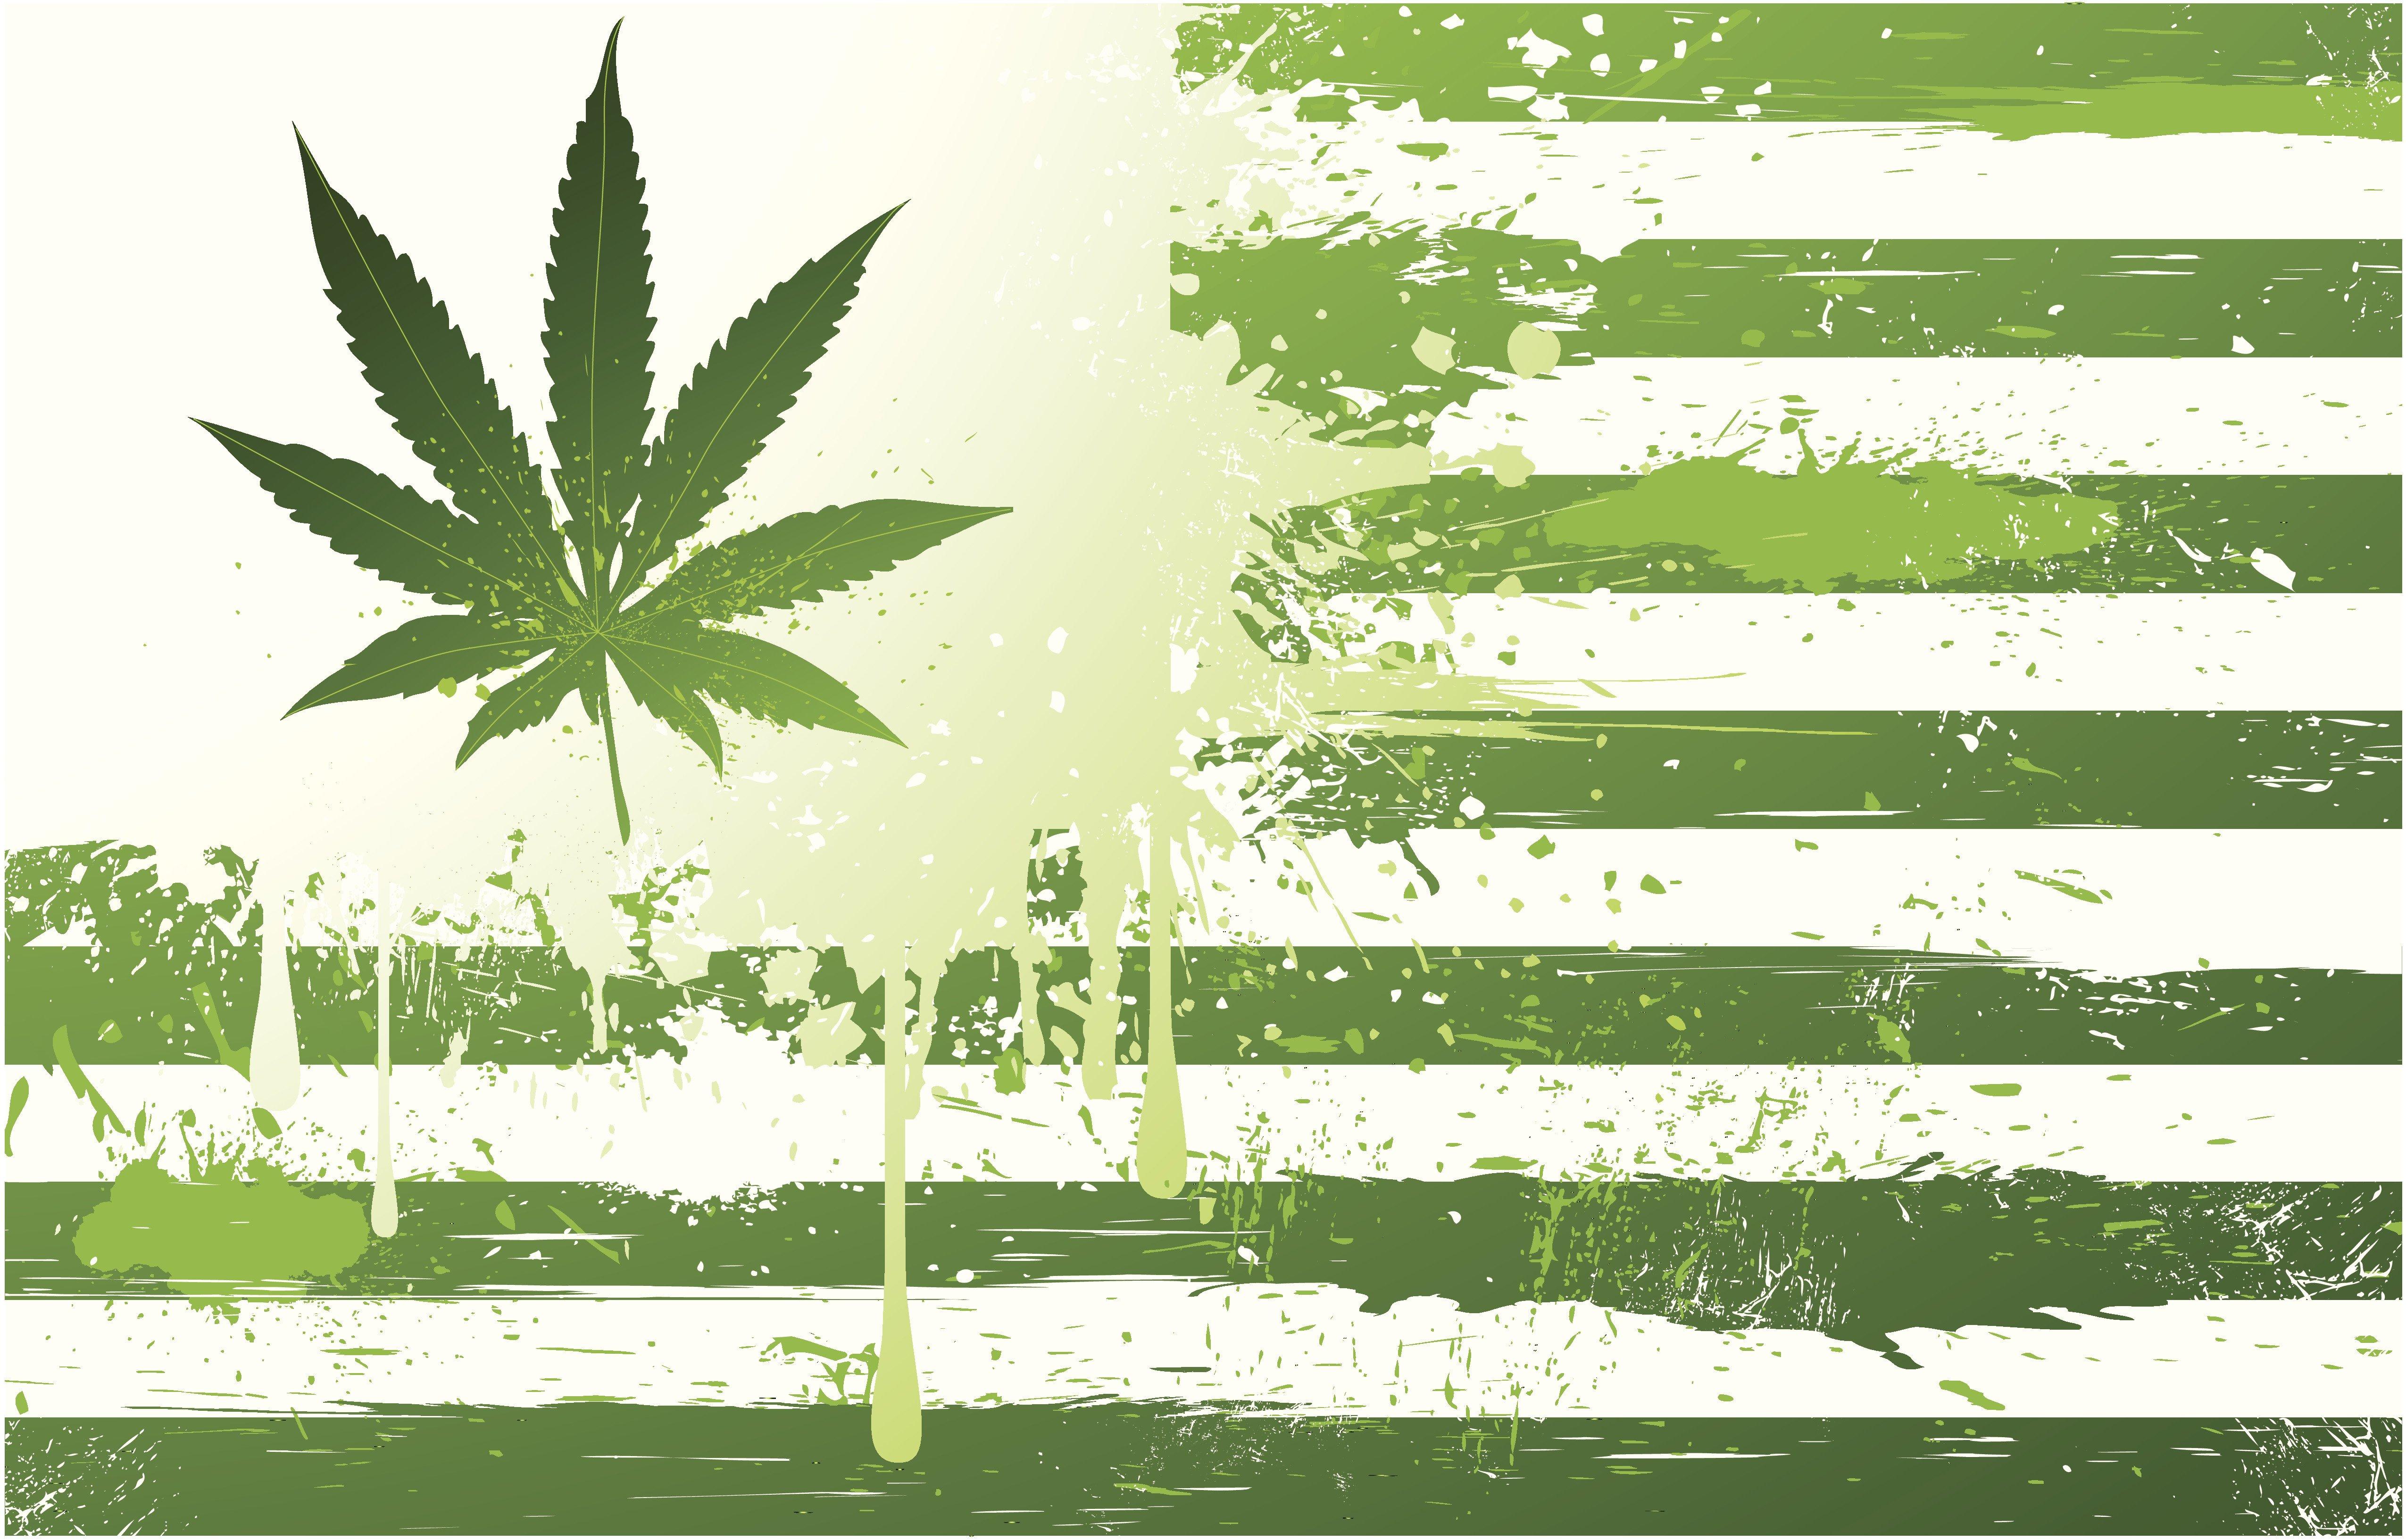 Marijuana 420 weed mary jane drugs (38) wallpaper background